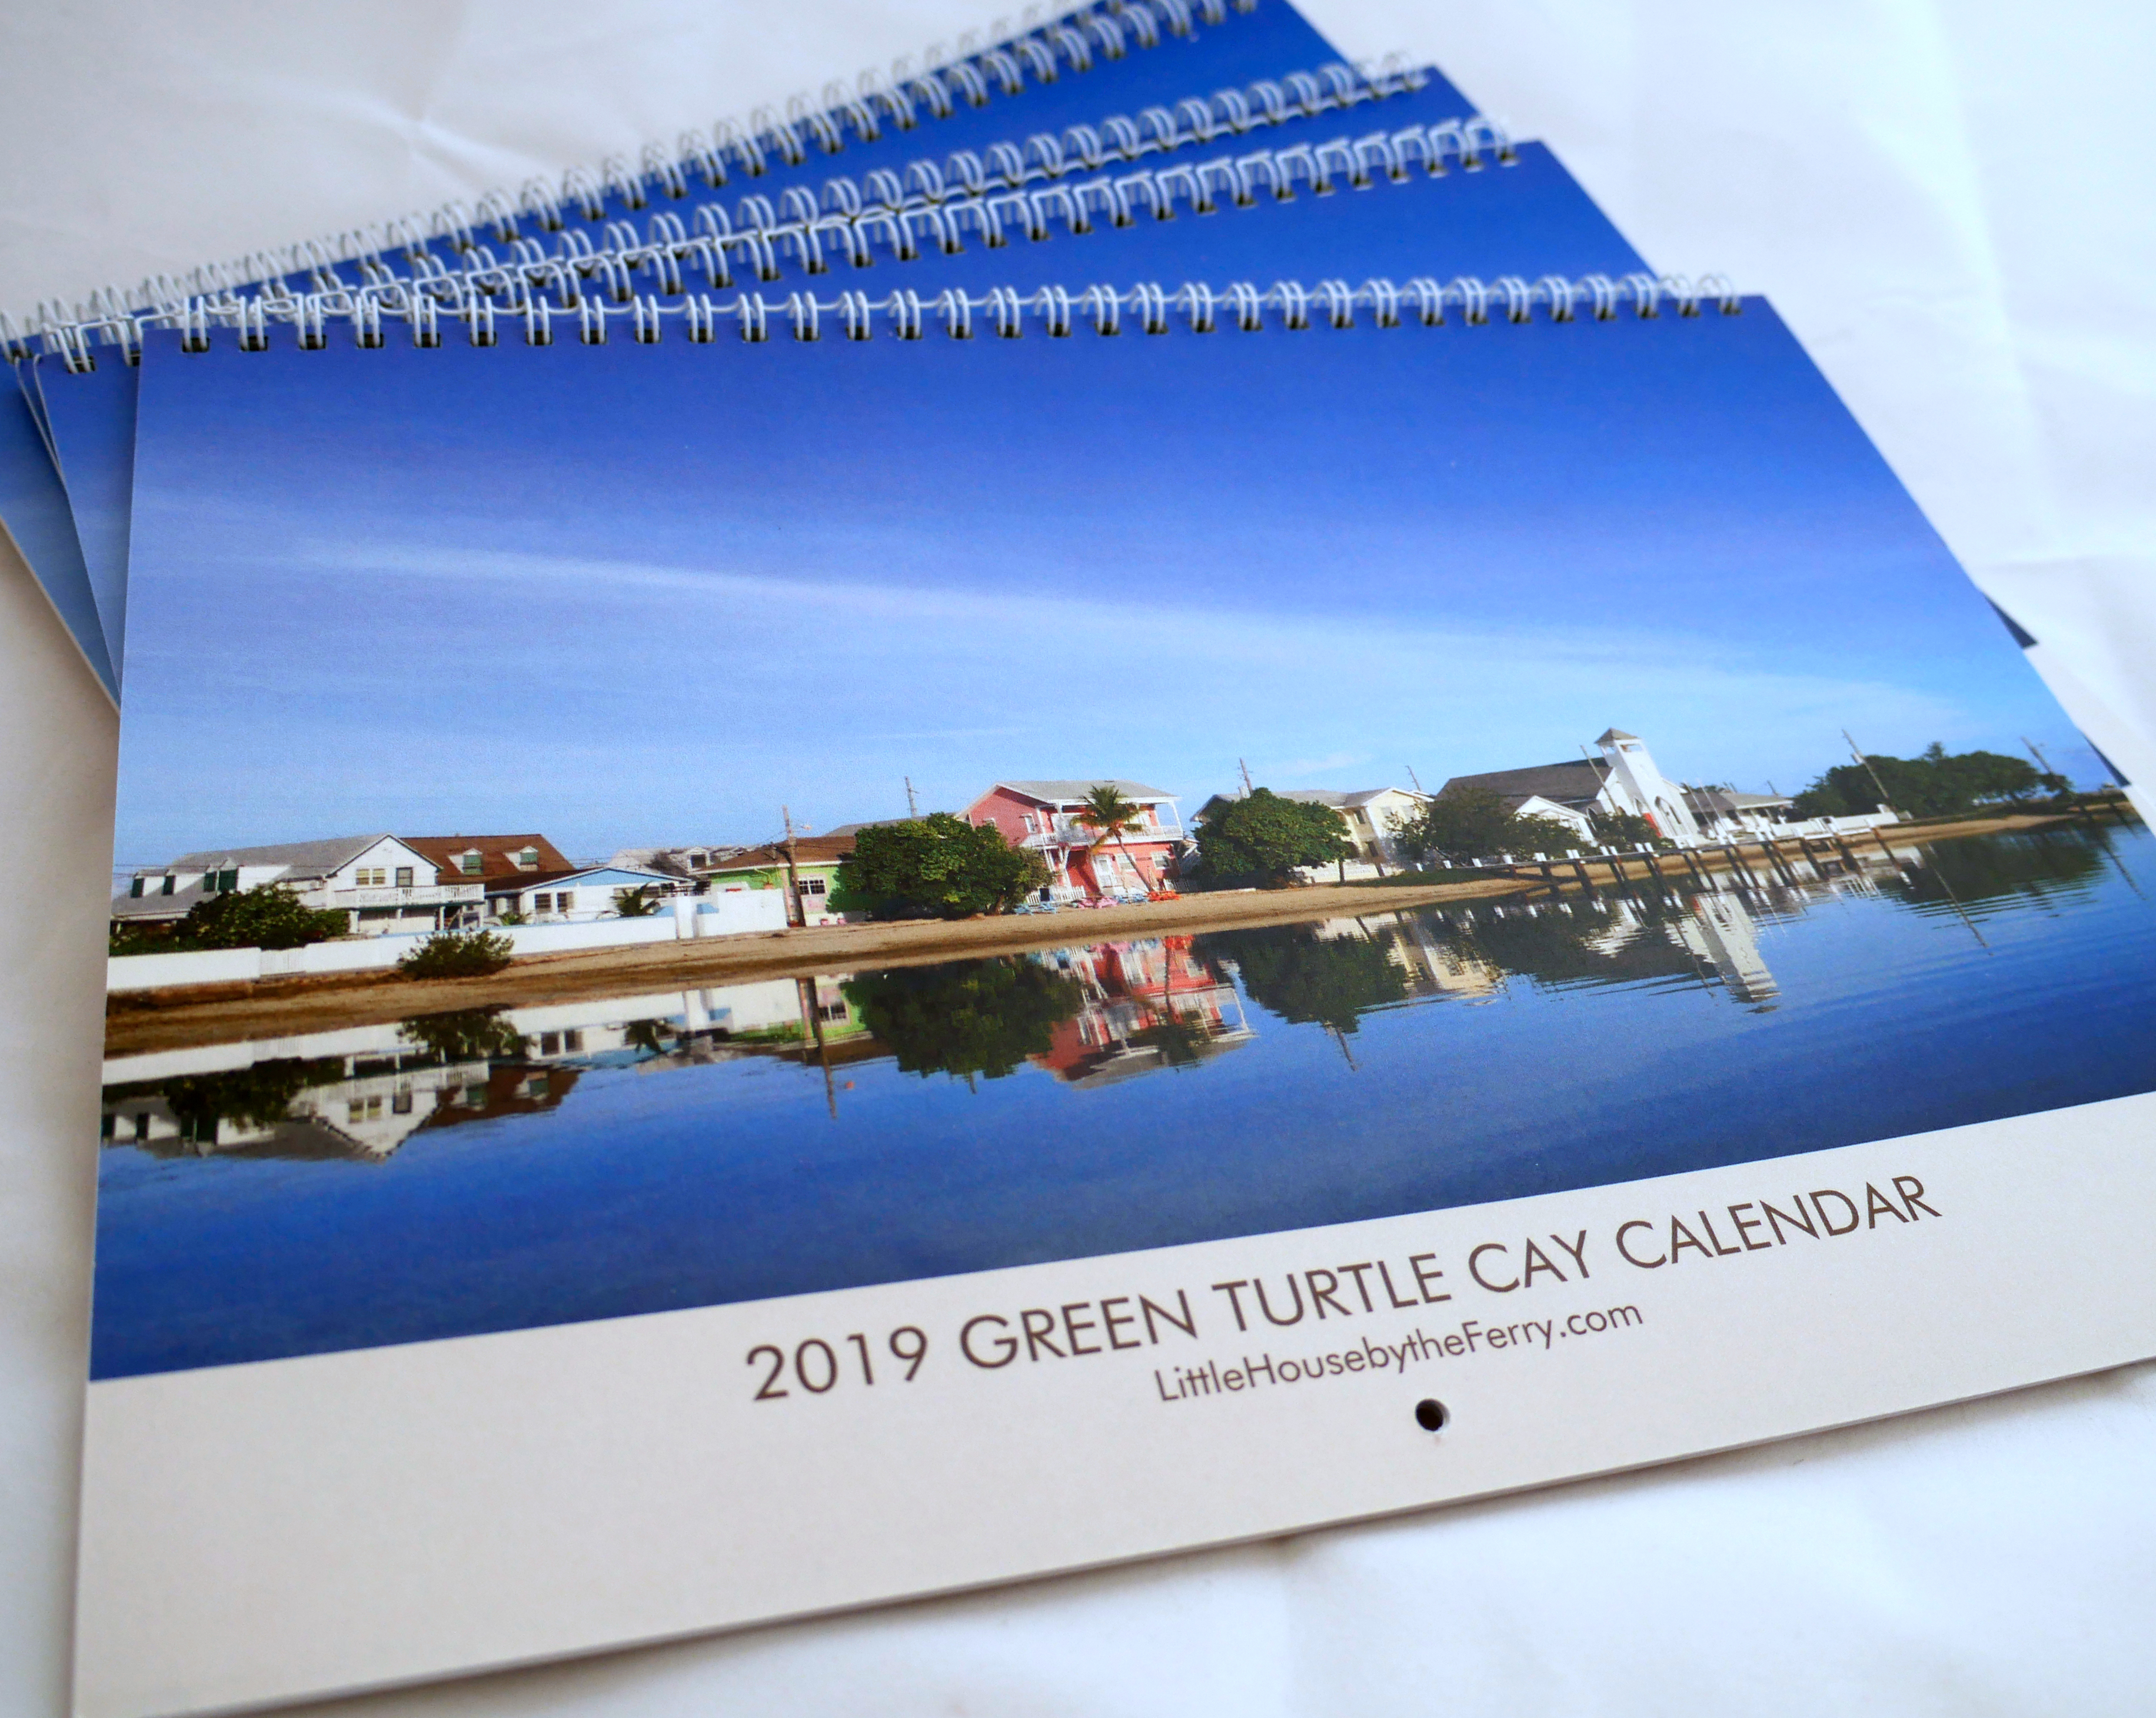 Green Turtle Cay Wall Calendar 2019